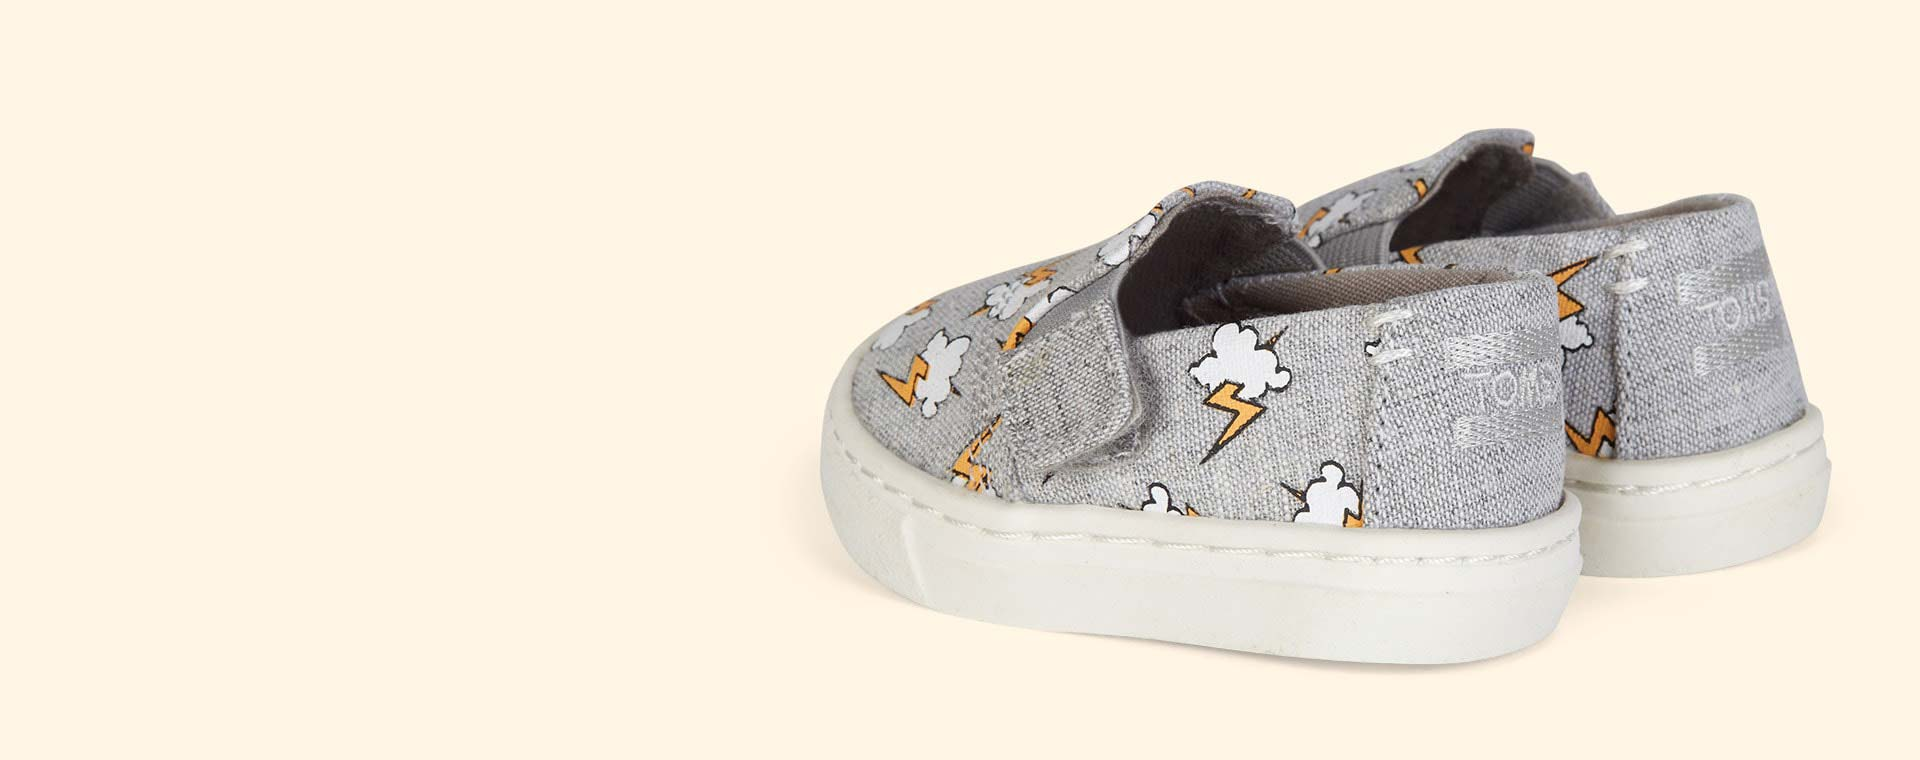 2092f3bd024b Buy the TOMS Luca Slip-On Shoe at KIDLY UK